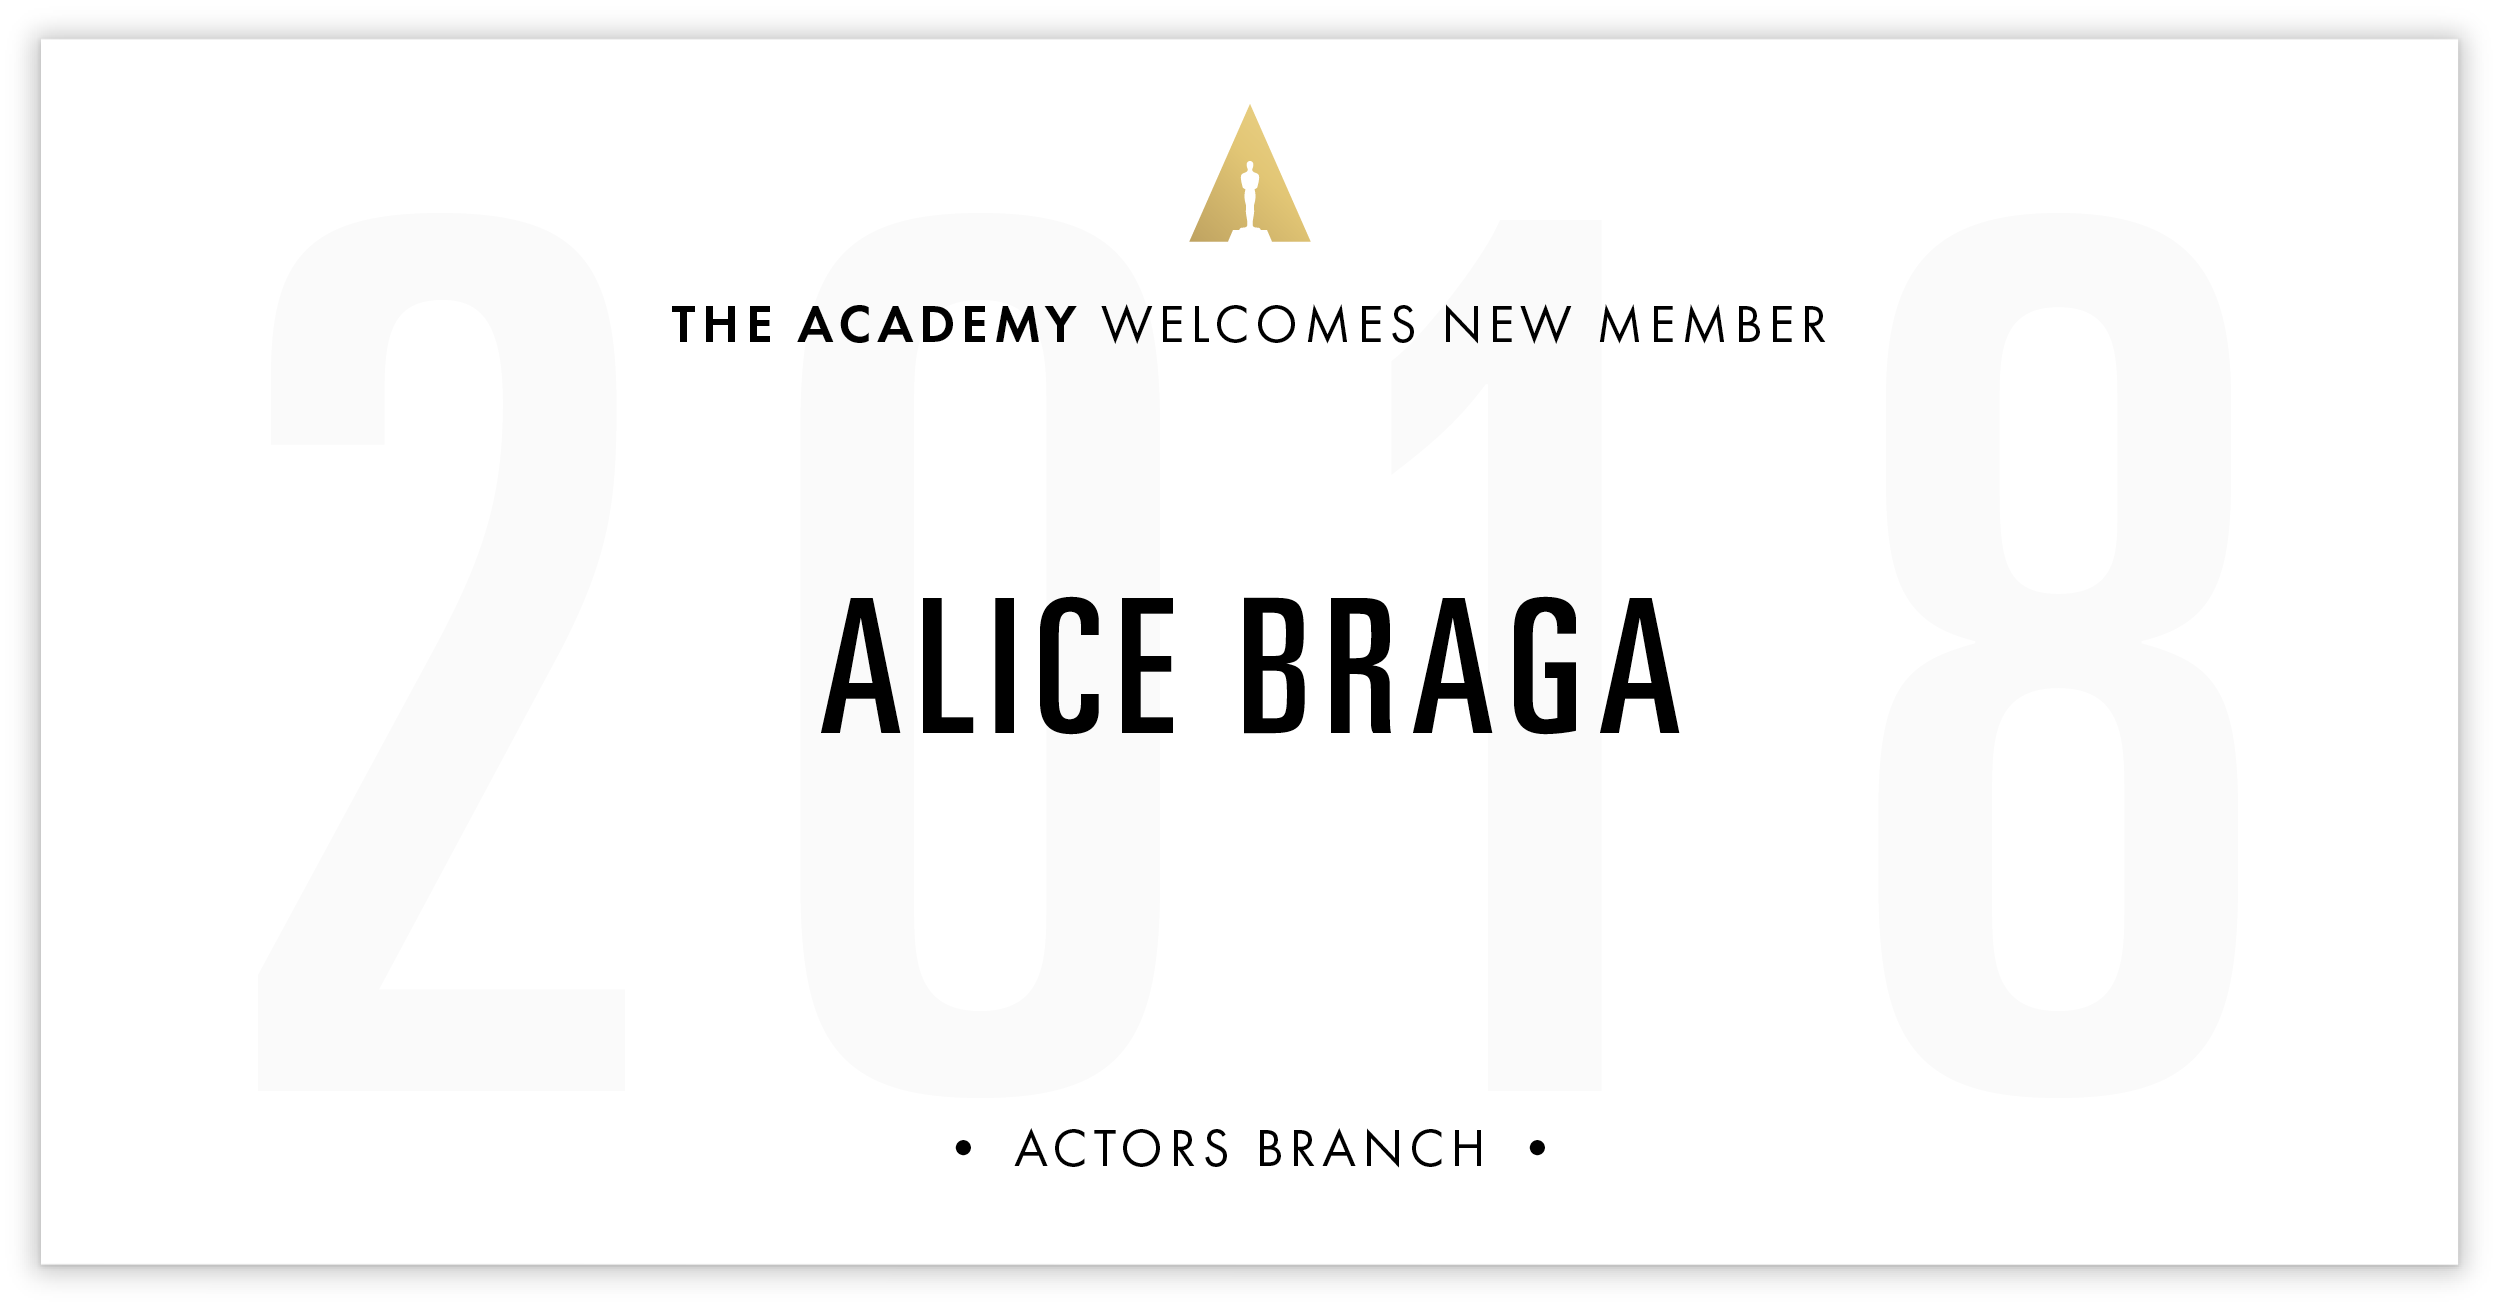 Alice Braga is invited!